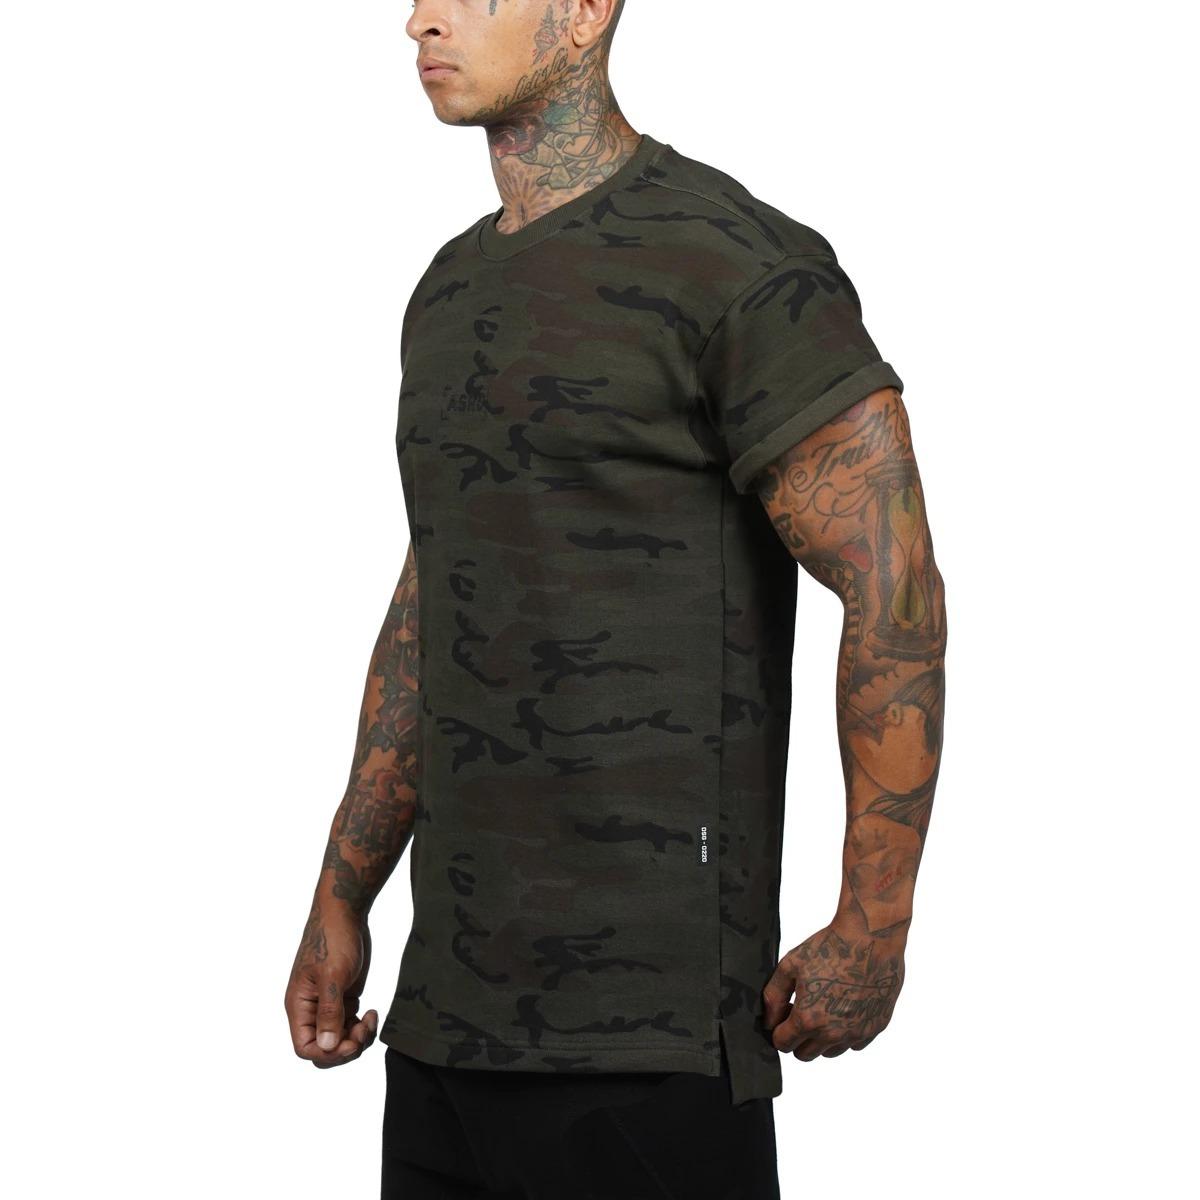 【ASRV】CottonPlus™ メッシュバックロールスリーブTシャツ - Dark Camo